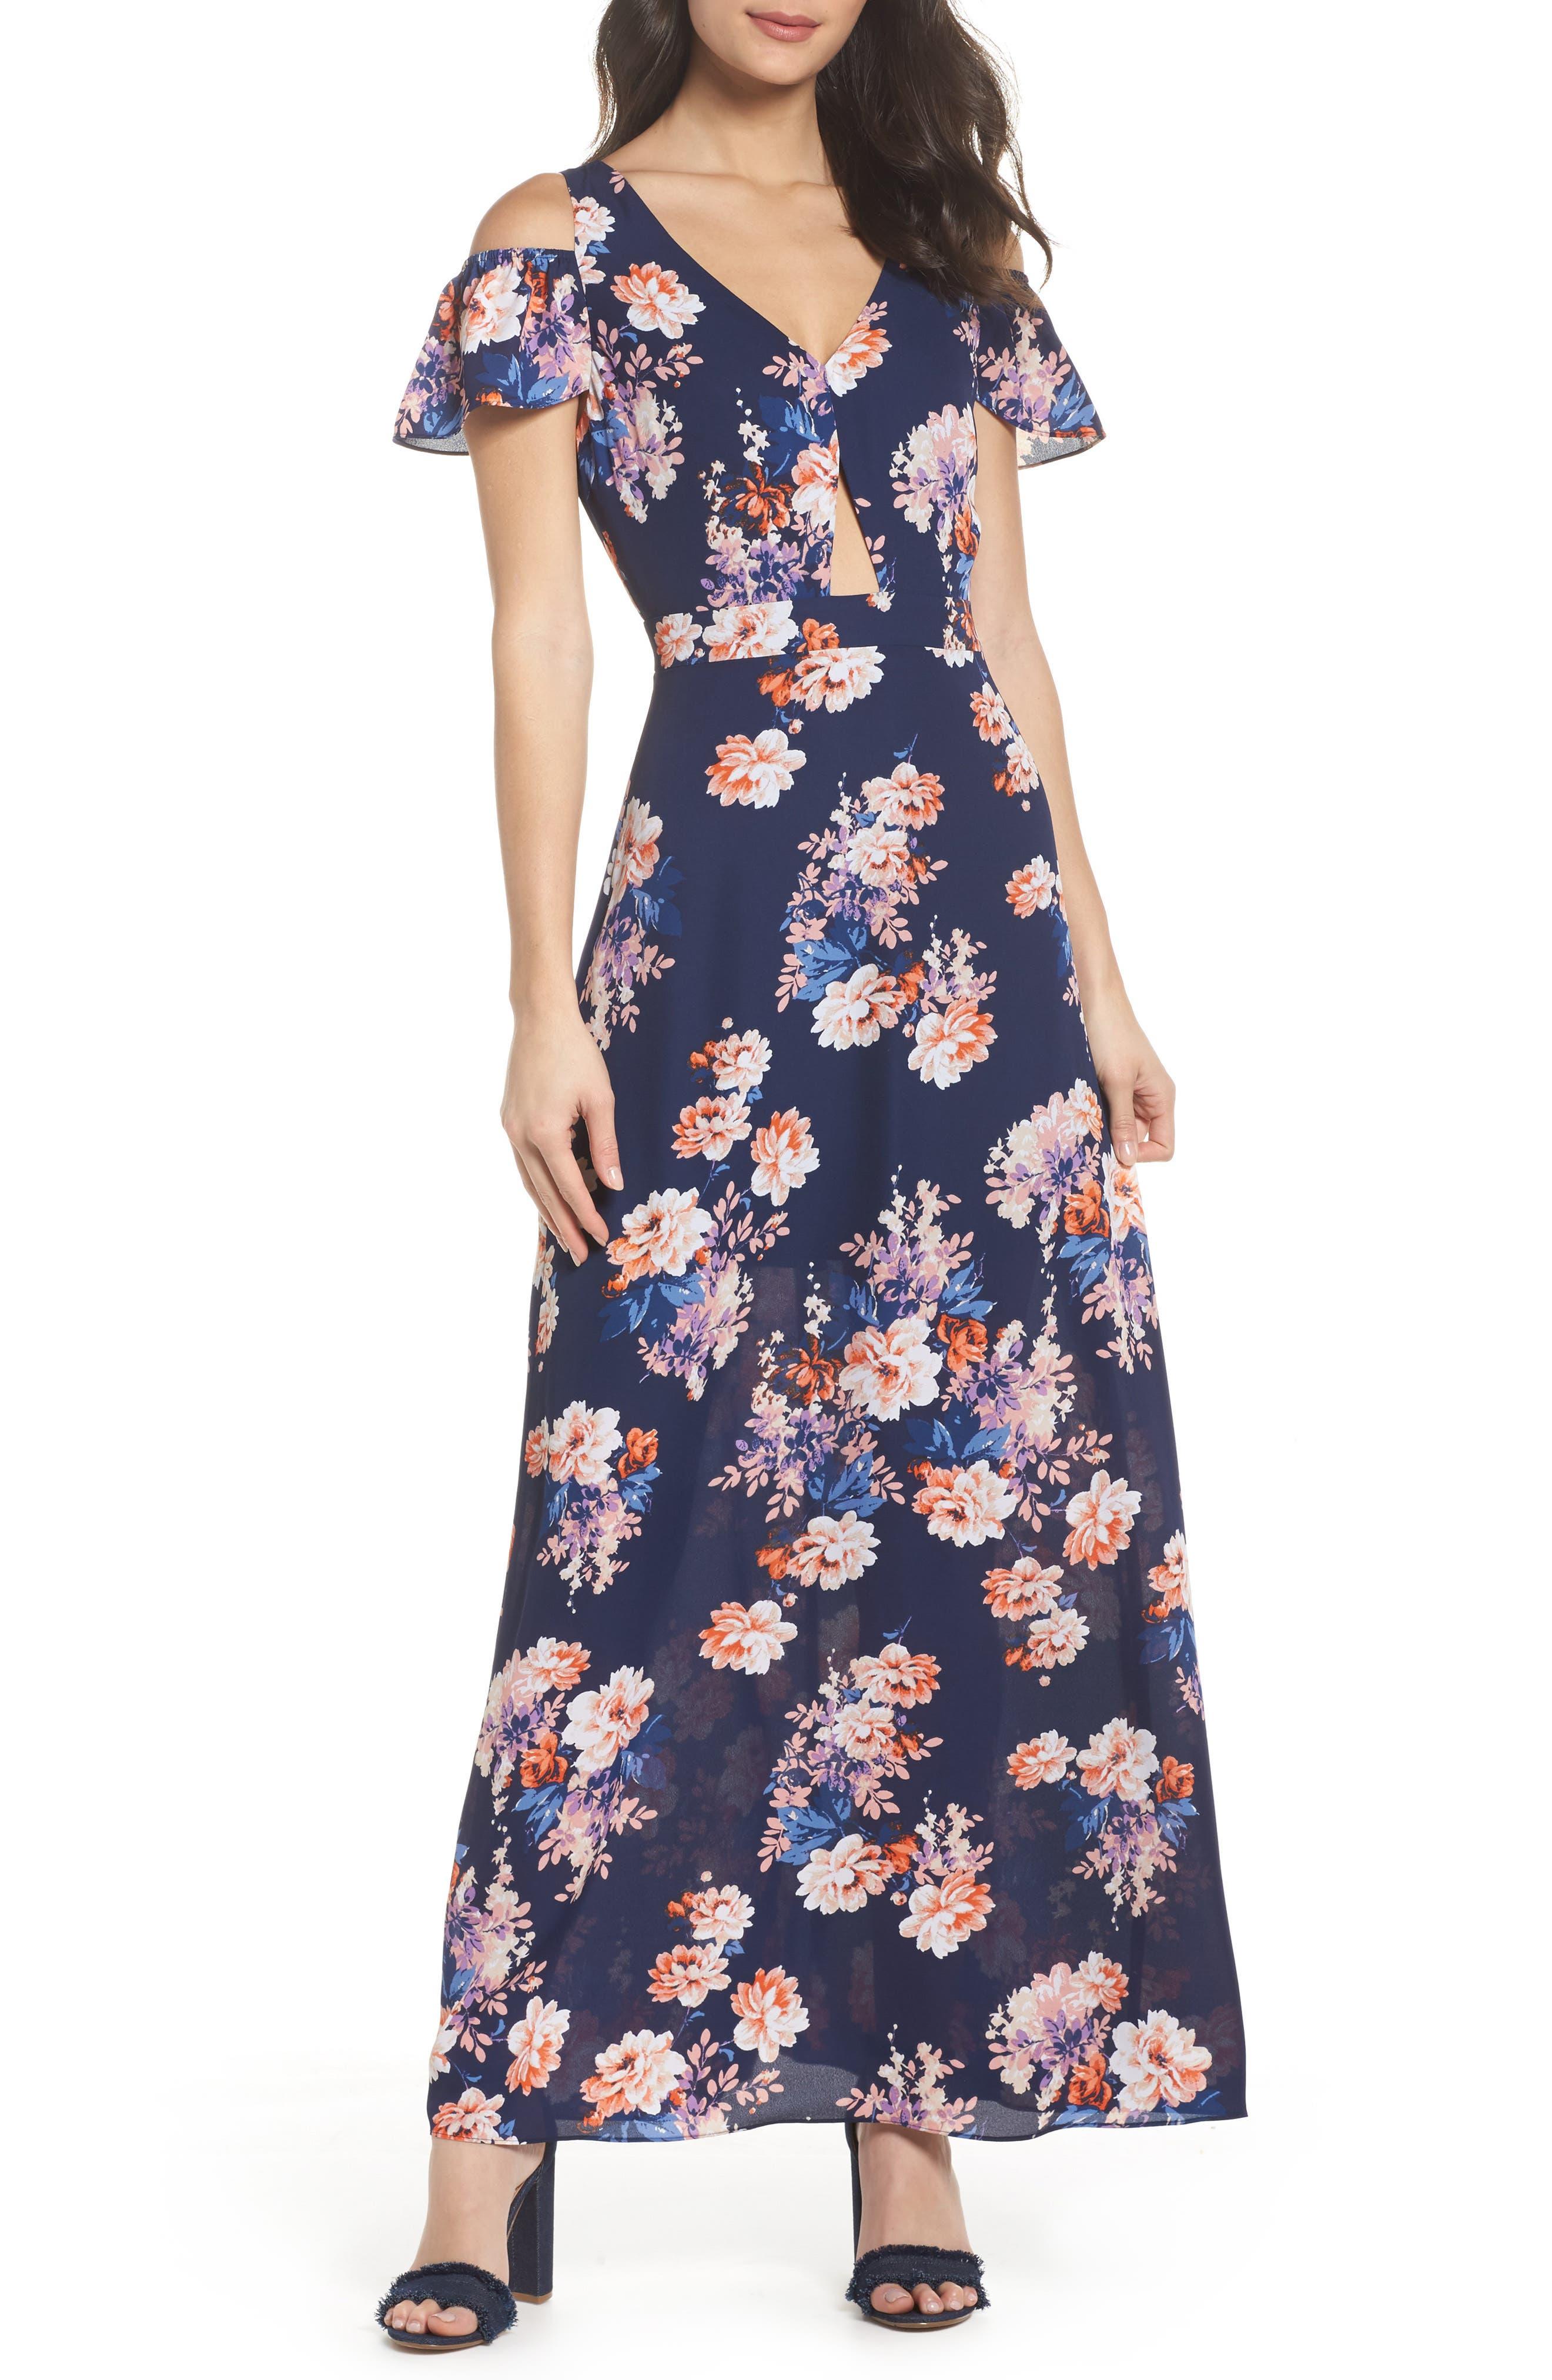 Chasing Butterflies Maxi Dress,                         Main,                         color, 400